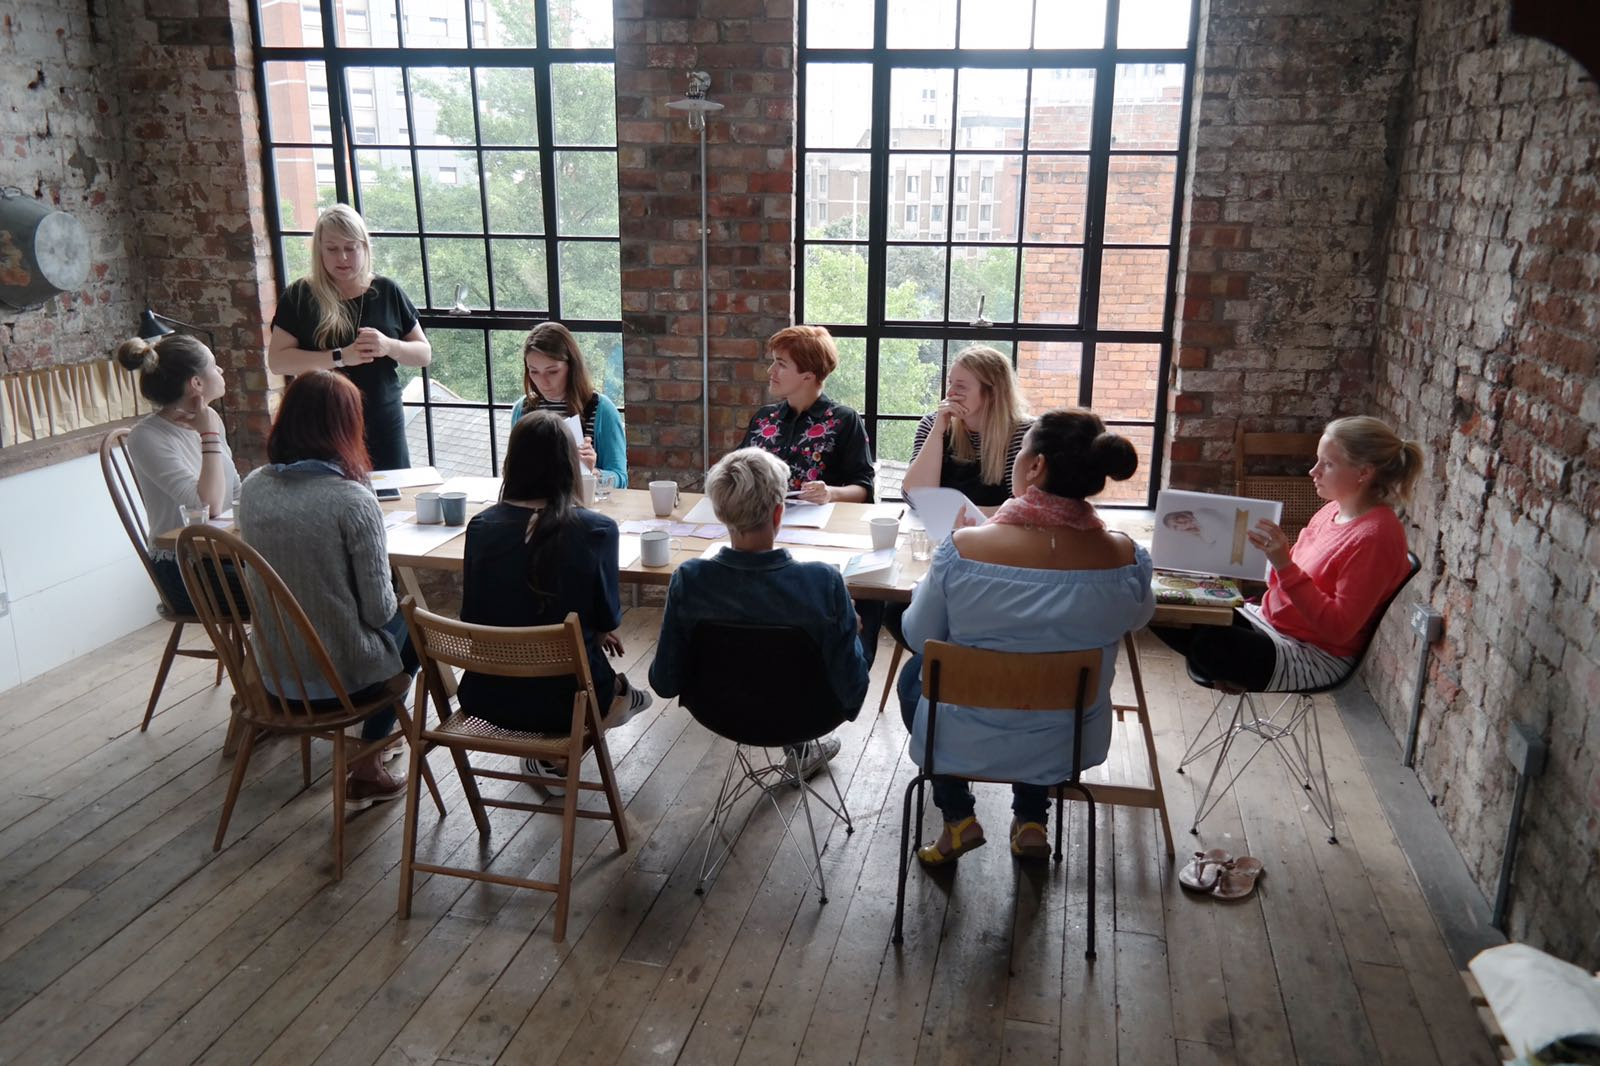 els pontin creative coaching session